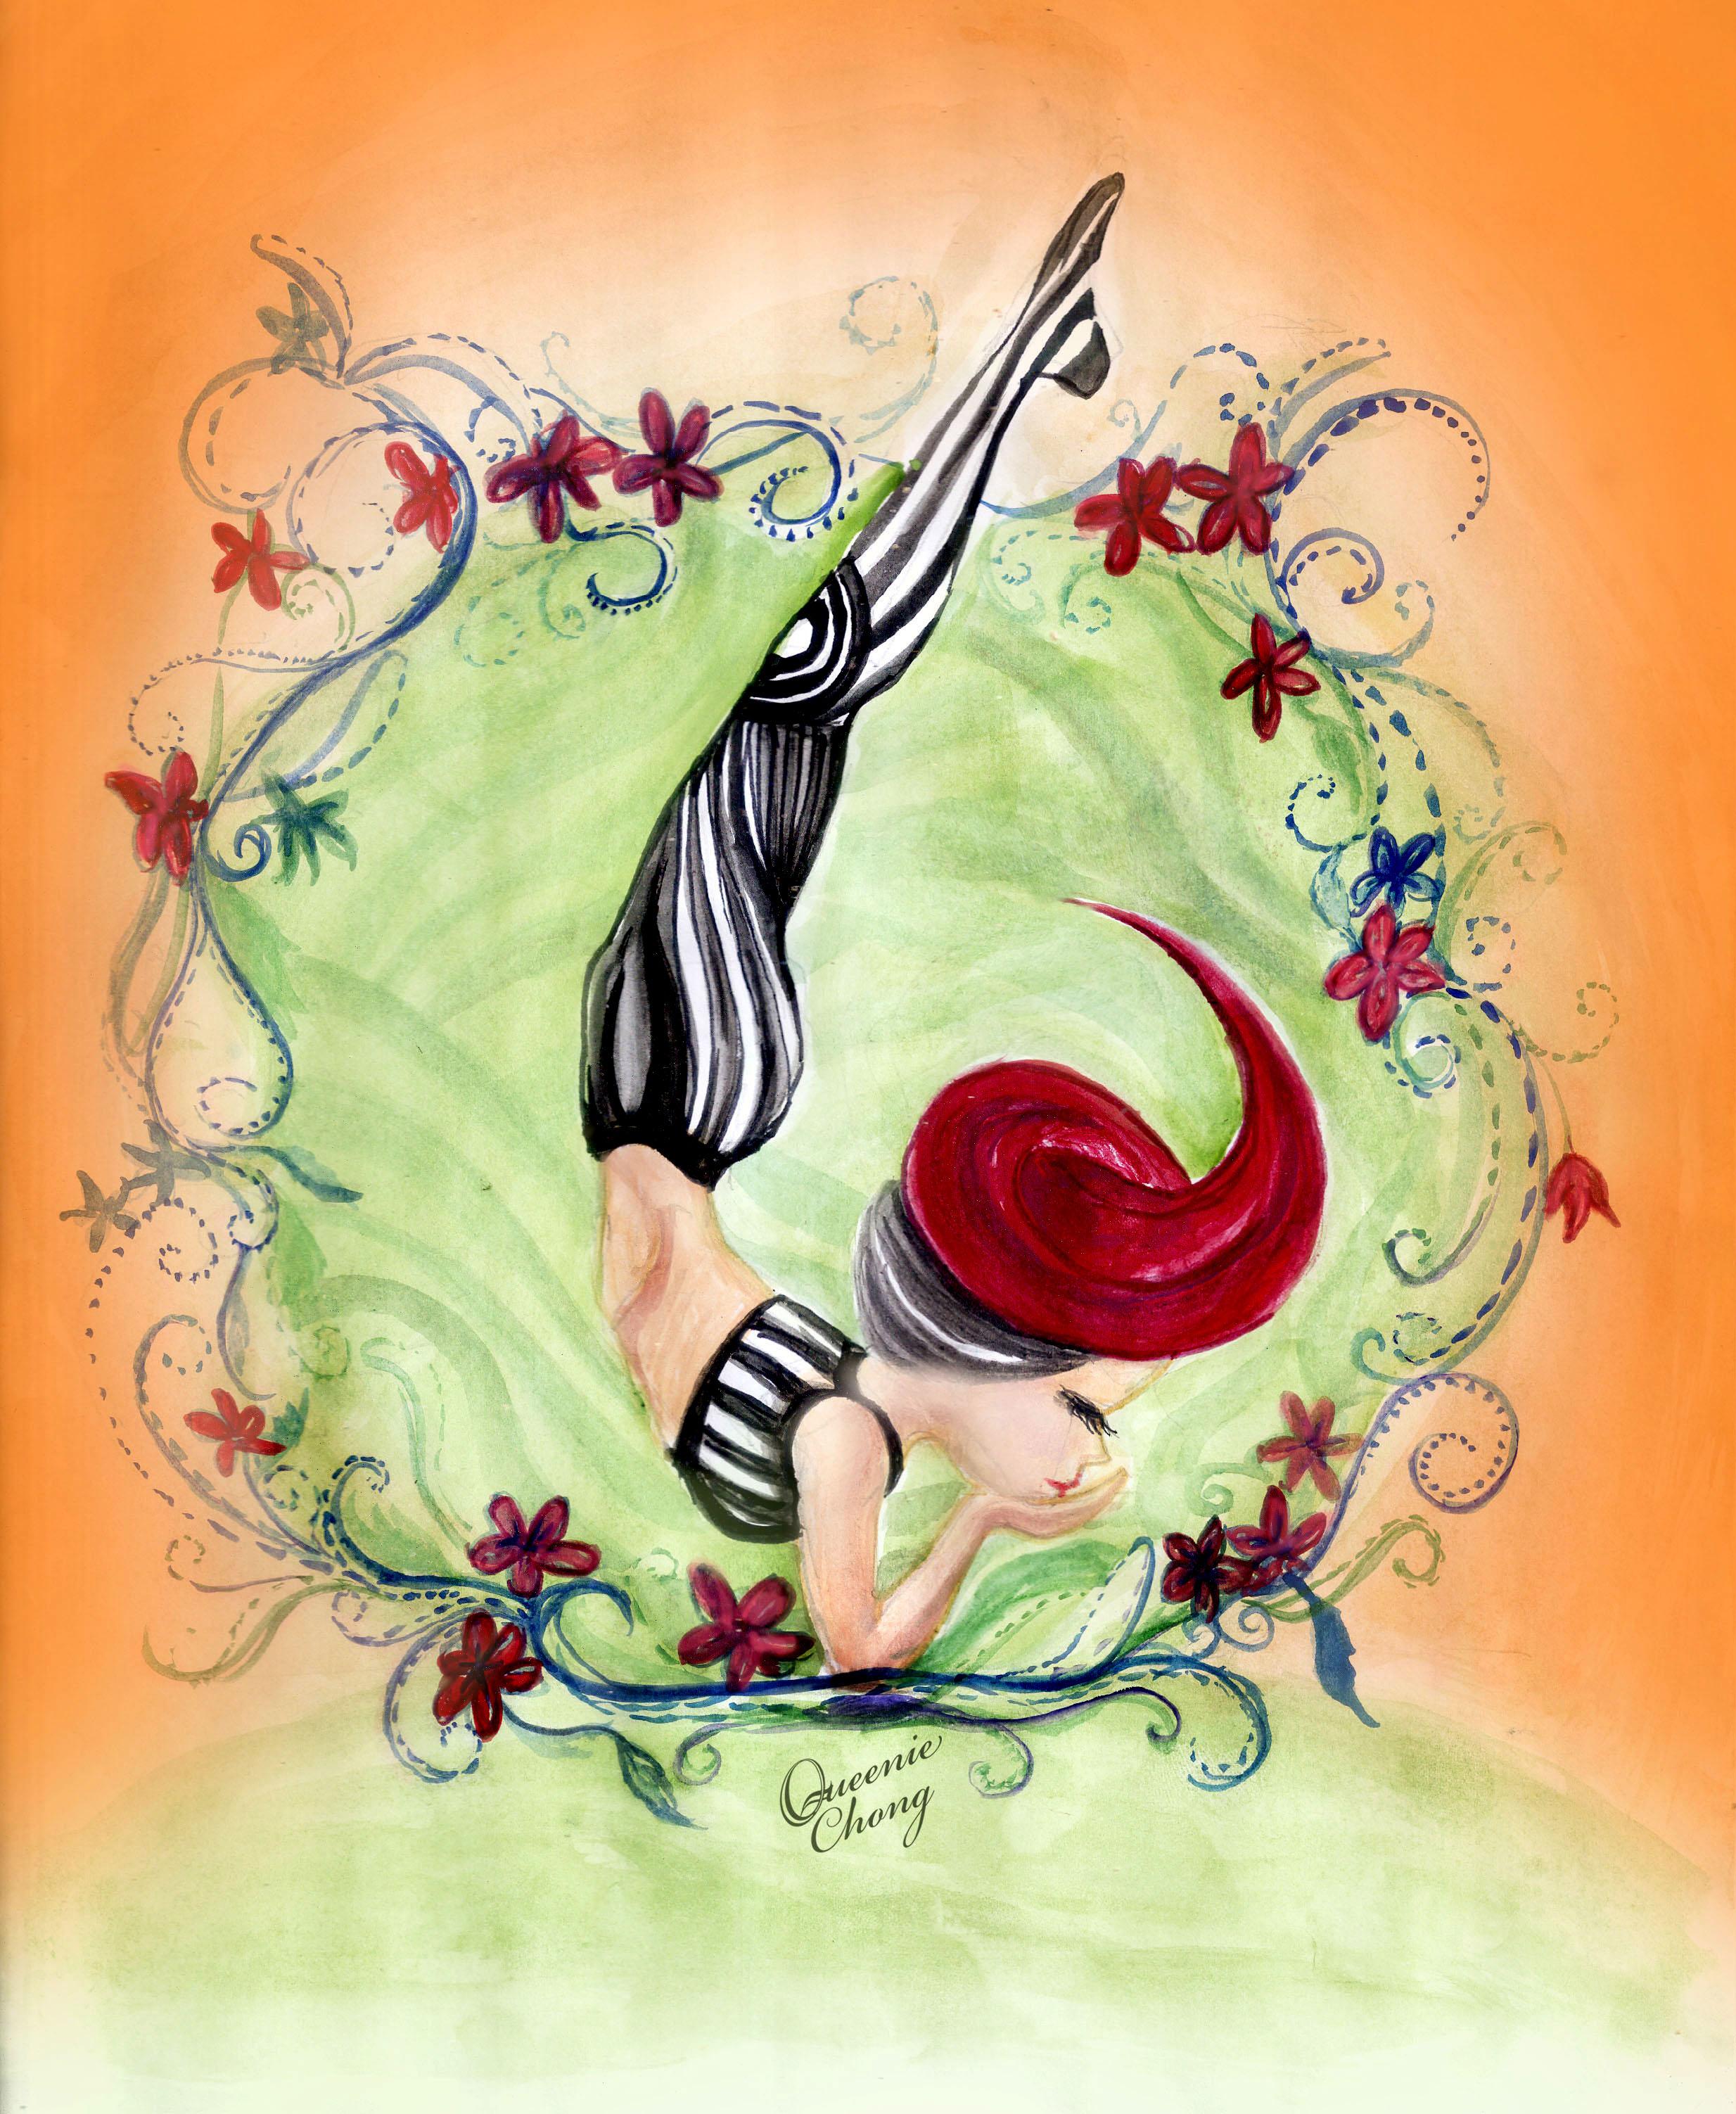 queenie_chamber_watercolor_yoga_05